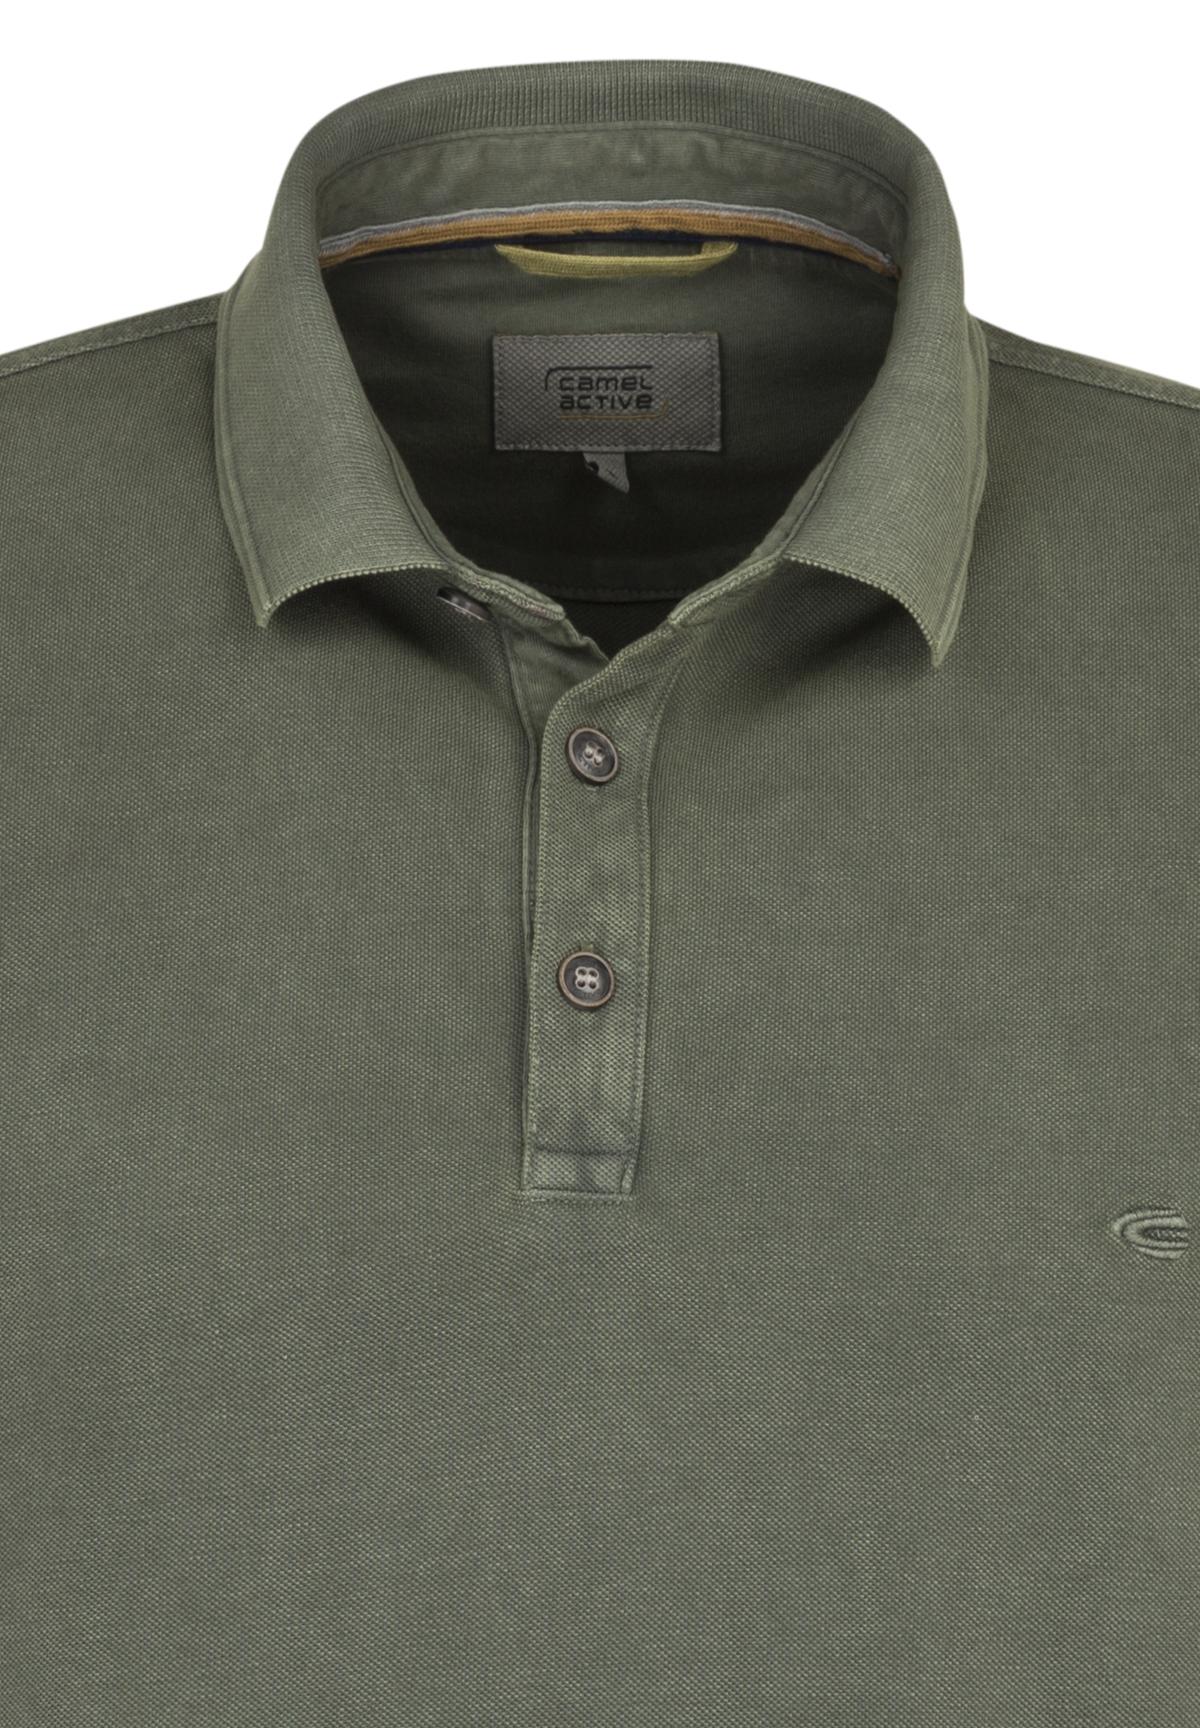 Camel-Active-Herren-Shirt-Poloshirt-Pique-Regular-Fit-NEU Indexbild 80